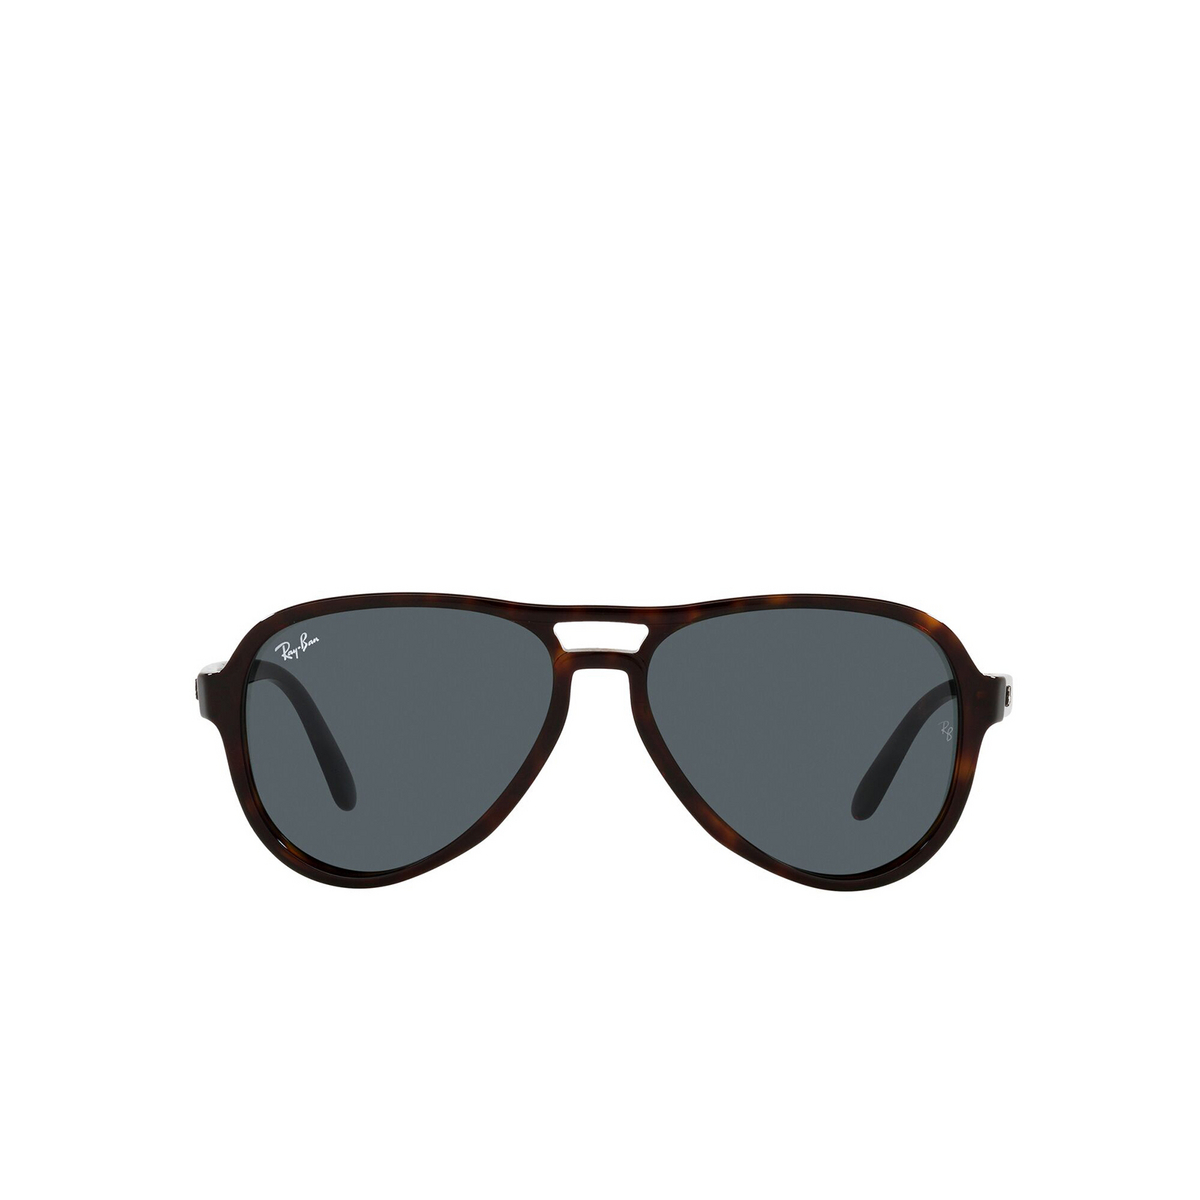 Ray-Ban® Aviator Sunglasses: Vagabond RB4355 color Havana 902/R5 - front view.